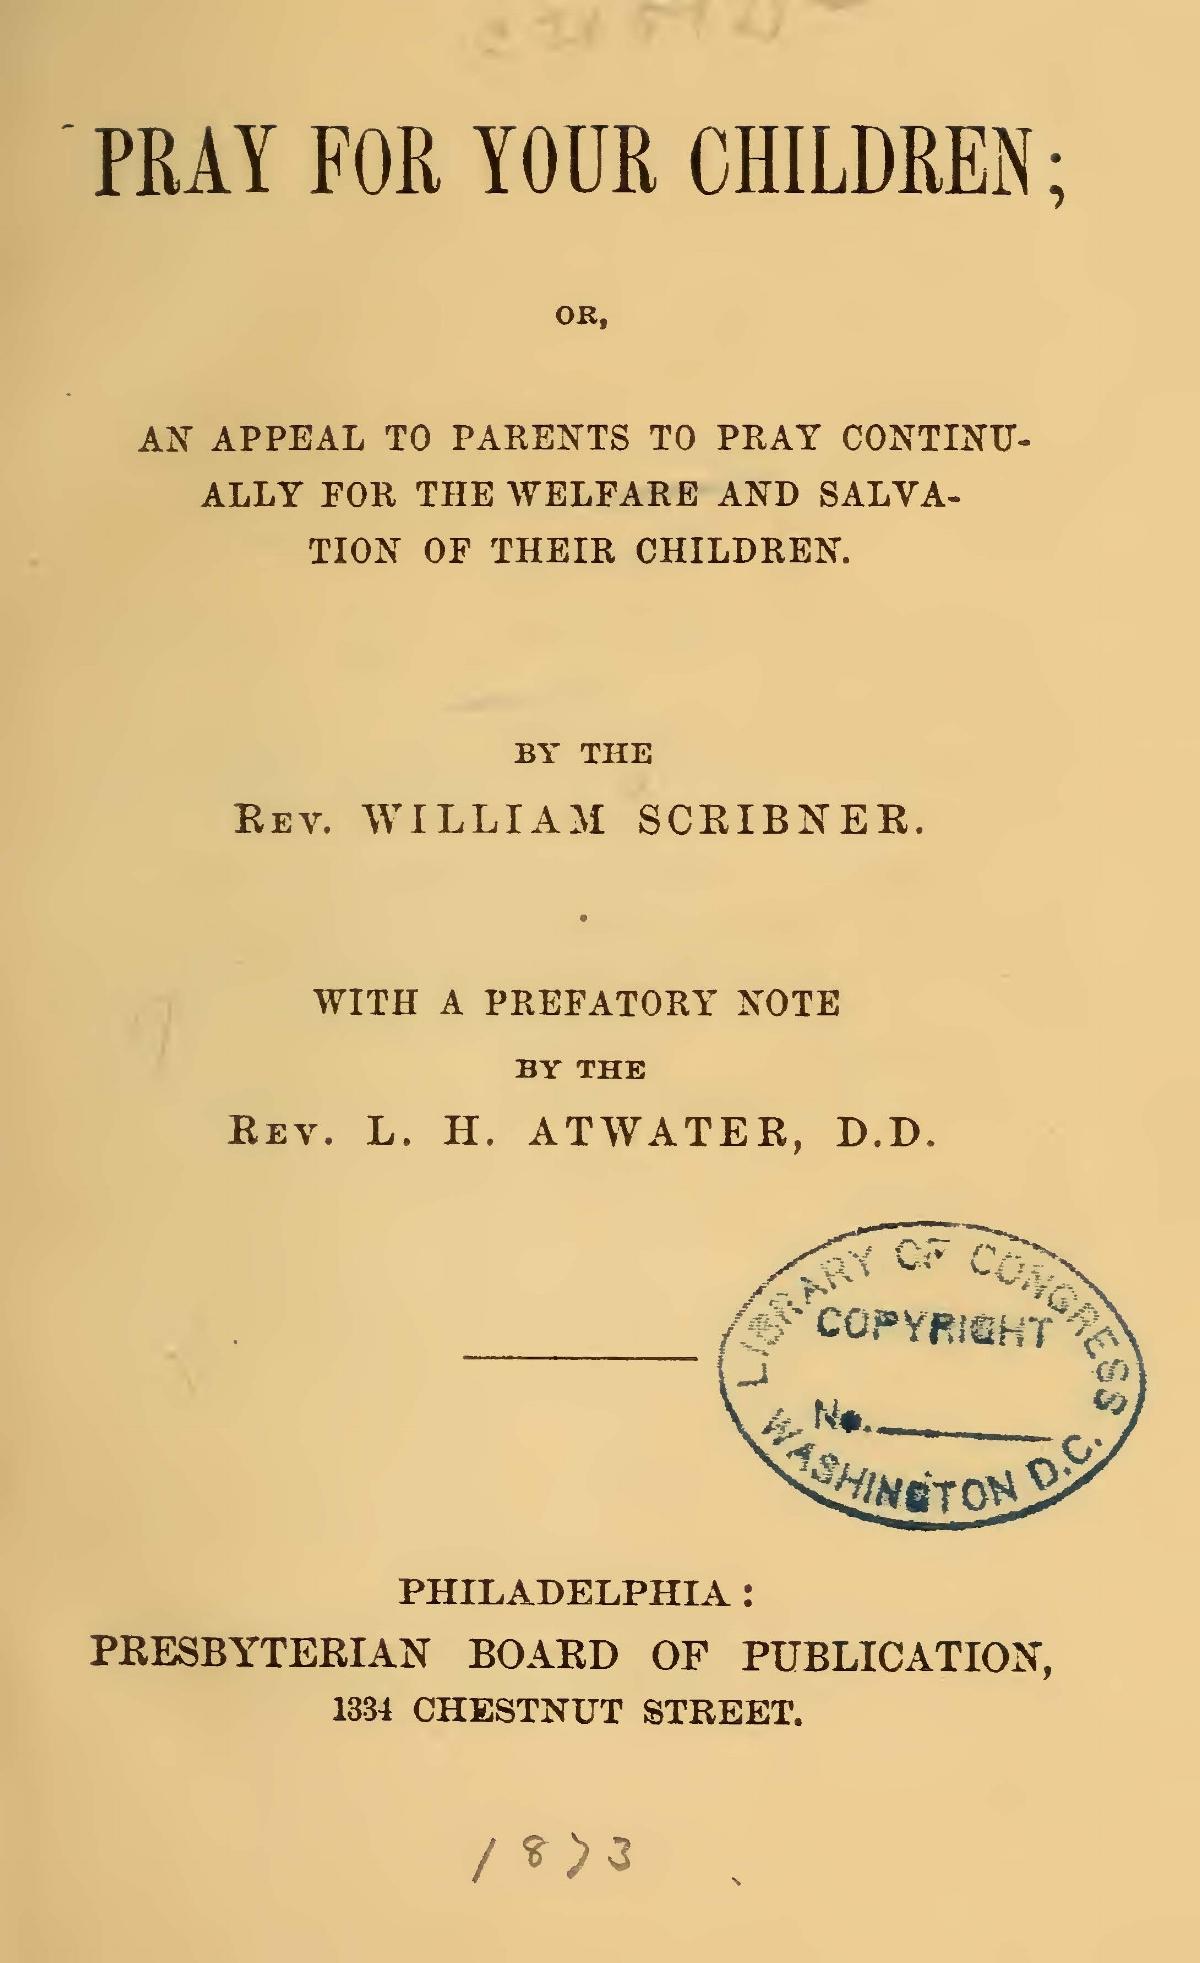 Scribner, William, Pray For Your Children Title Page.jpg